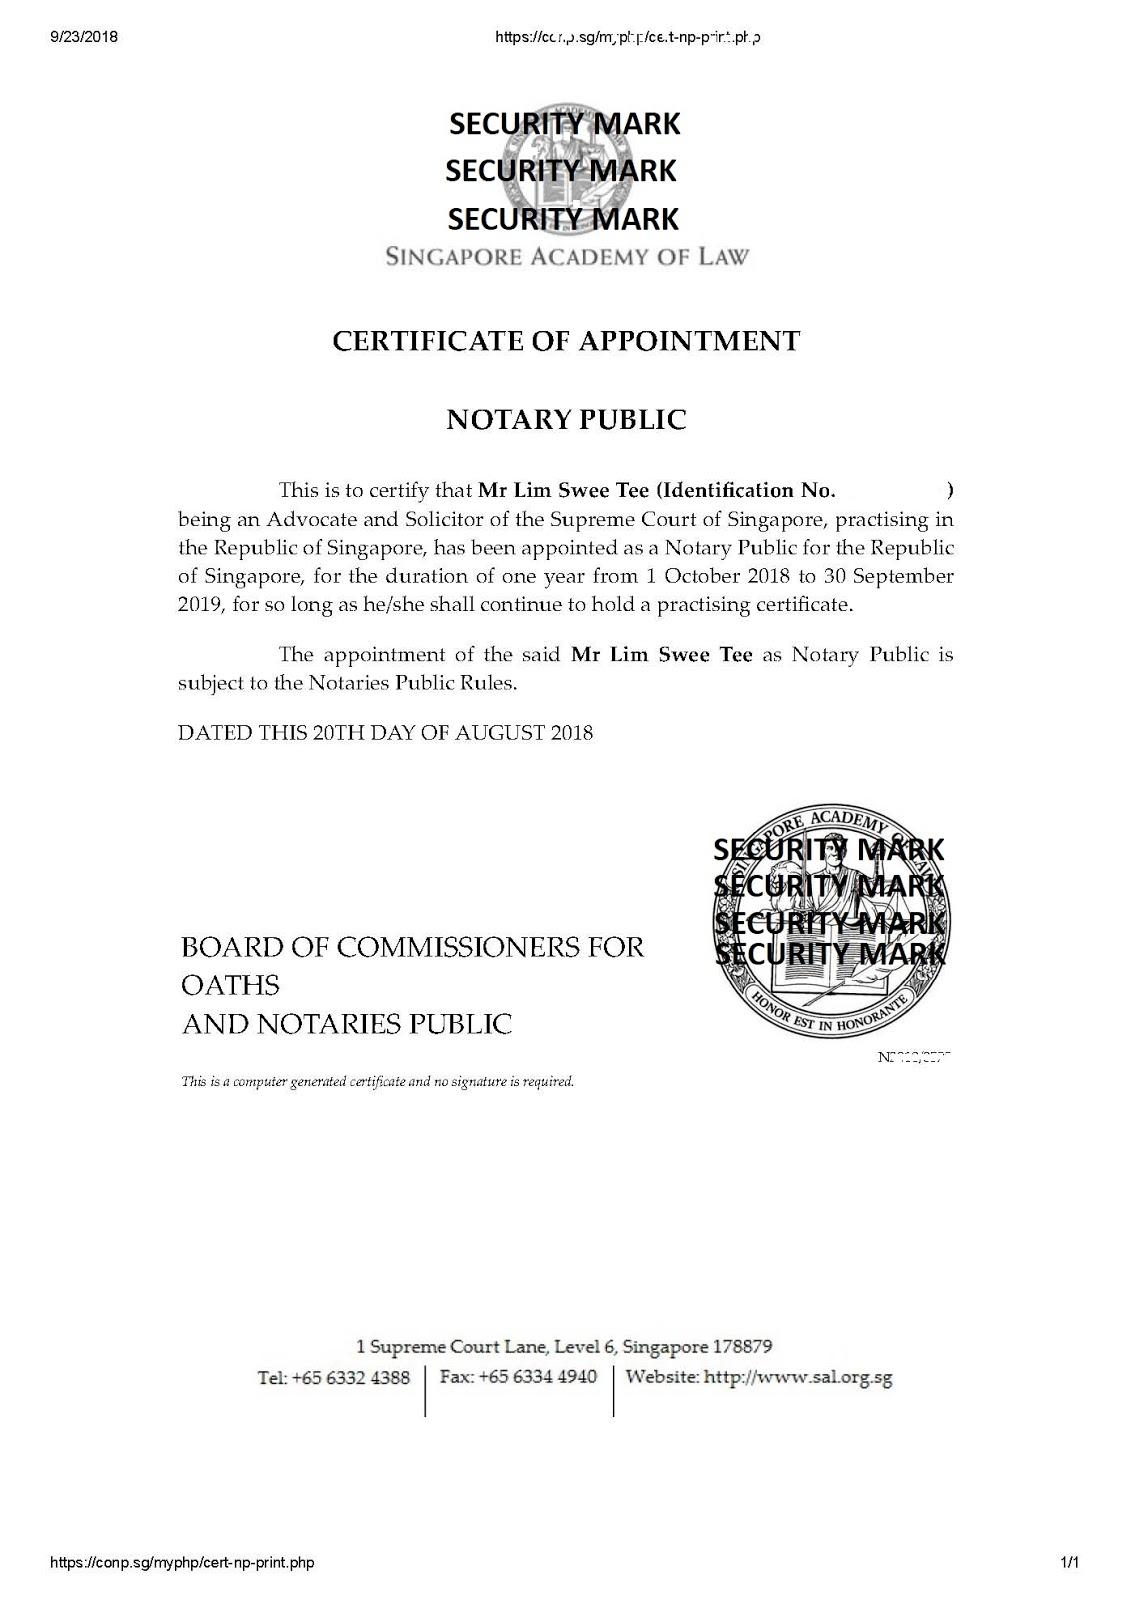 Certified Translation Translation Of Malaysian Documents Prc